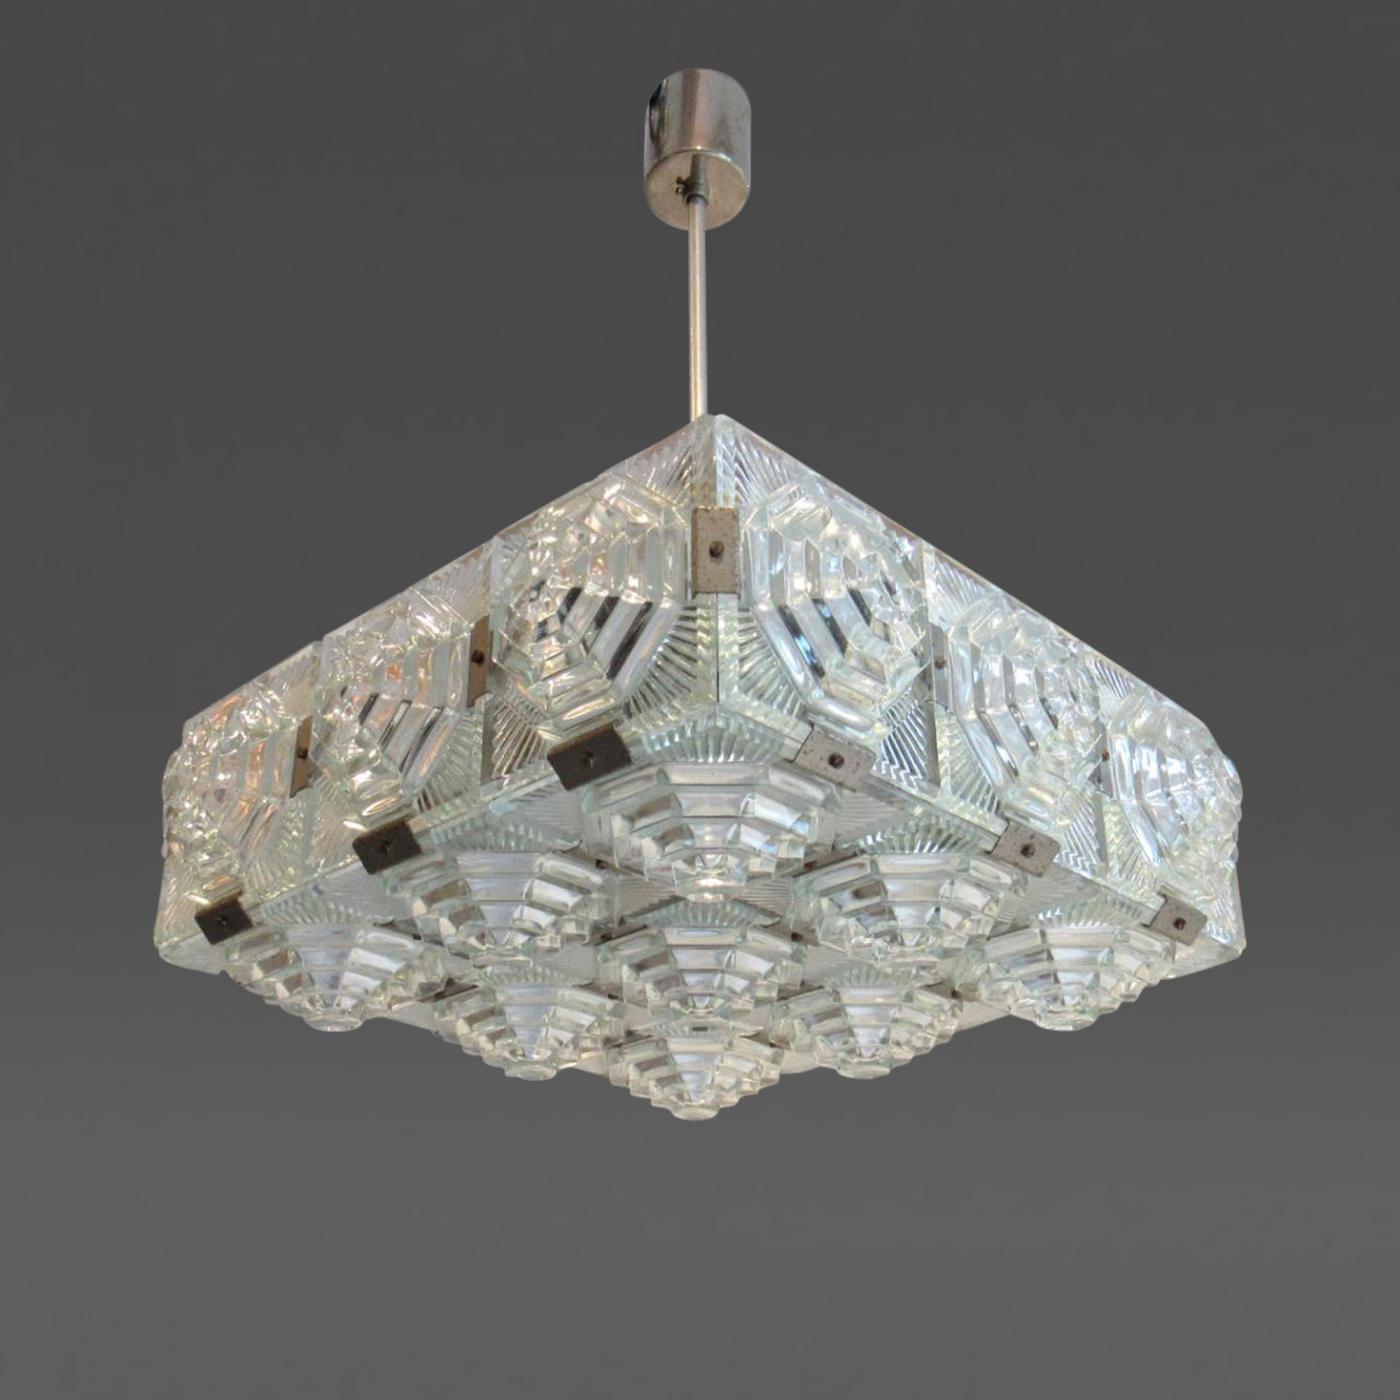 Listings Furniture Lighting Chandeliers And Pendants European Mid Century Modern Cube Light Fixture